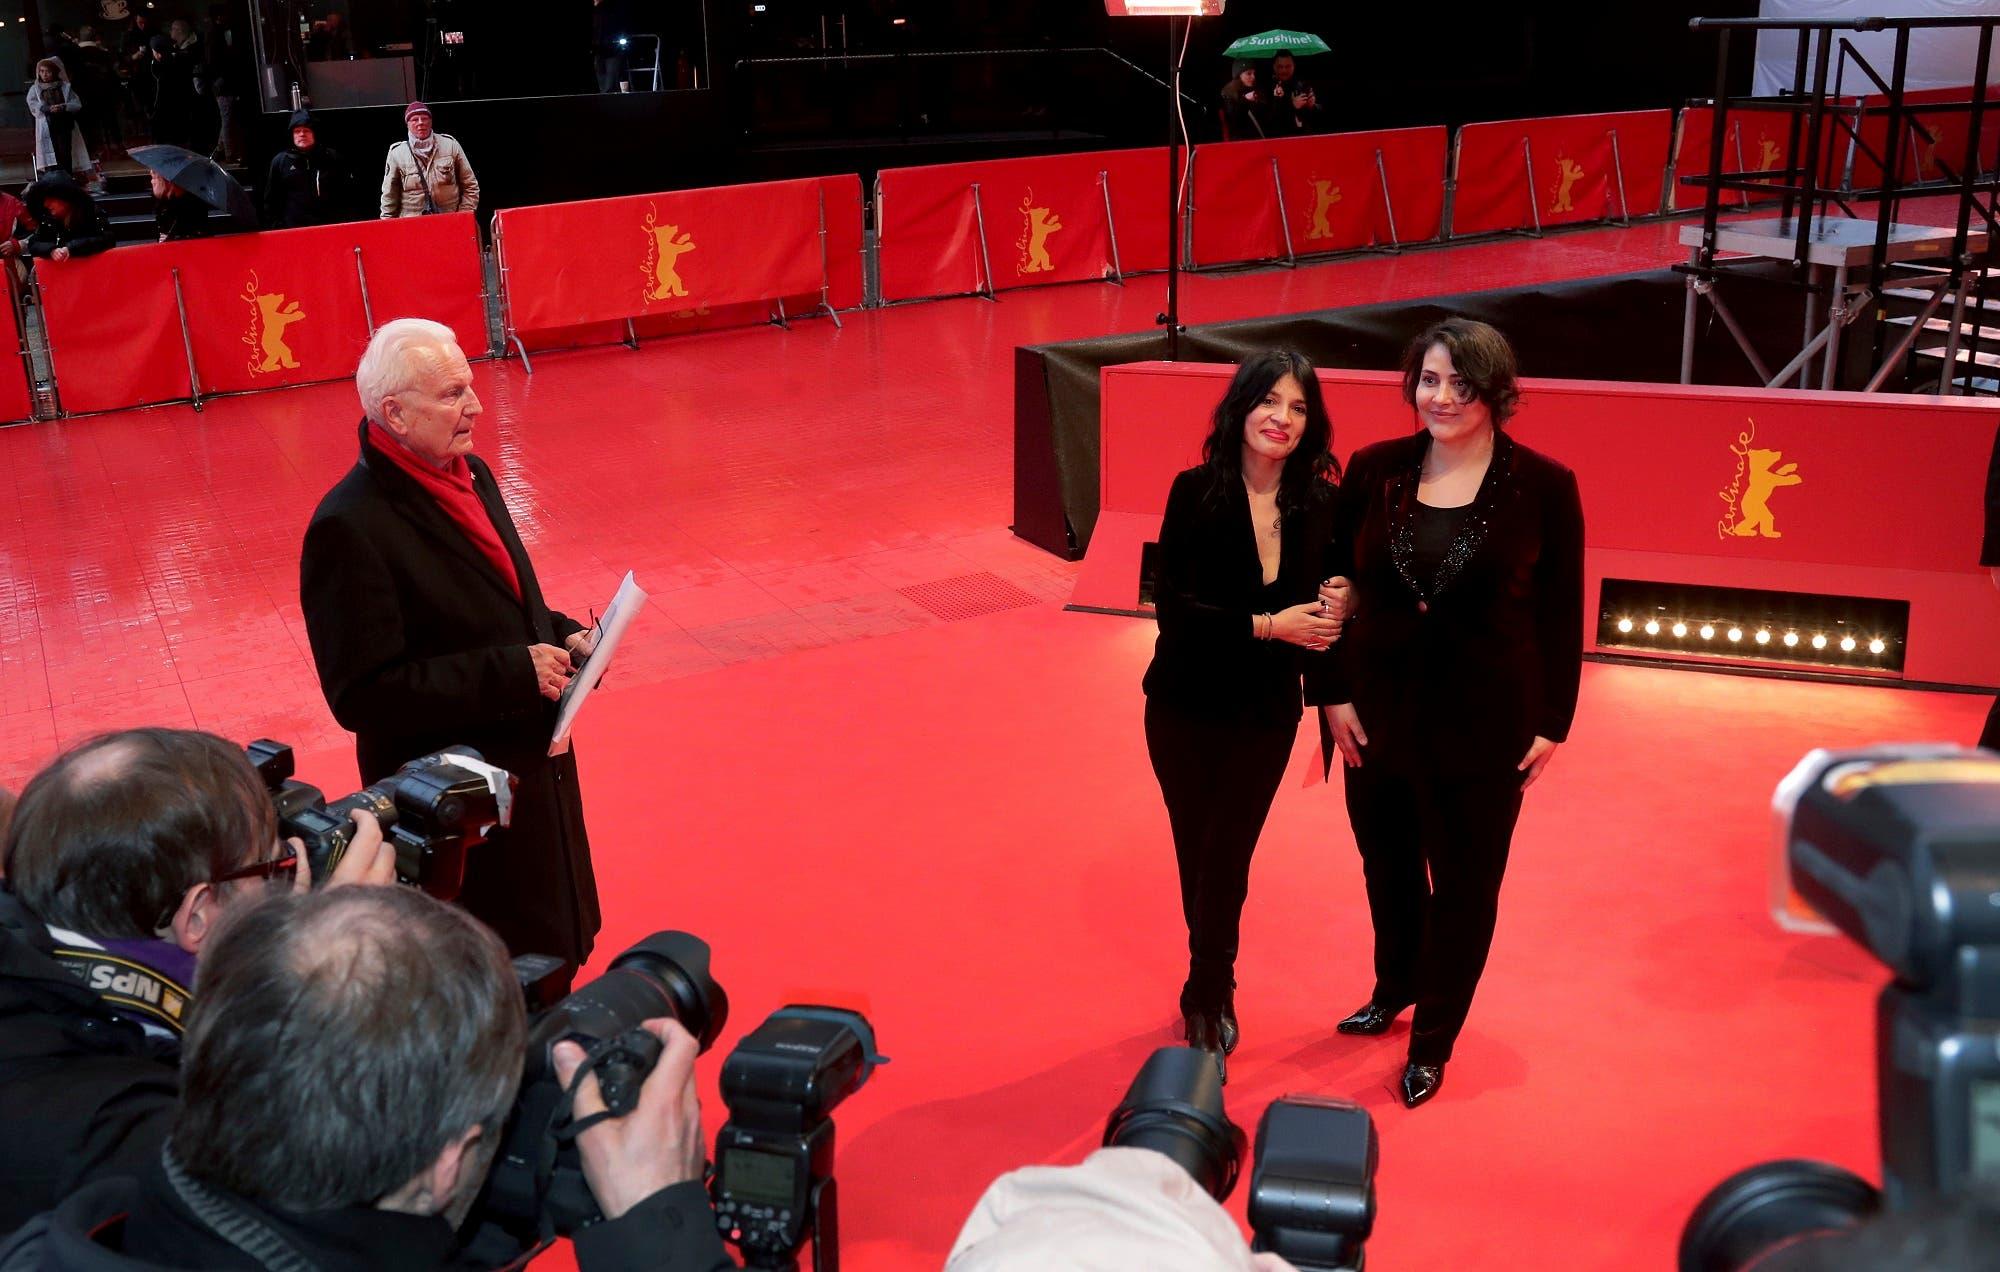 Director Teona Strugar Mitevska, left, and actress Zorica Nusheva, right, at the 2019 Berlinale Film Festival in Berlin. (AP)